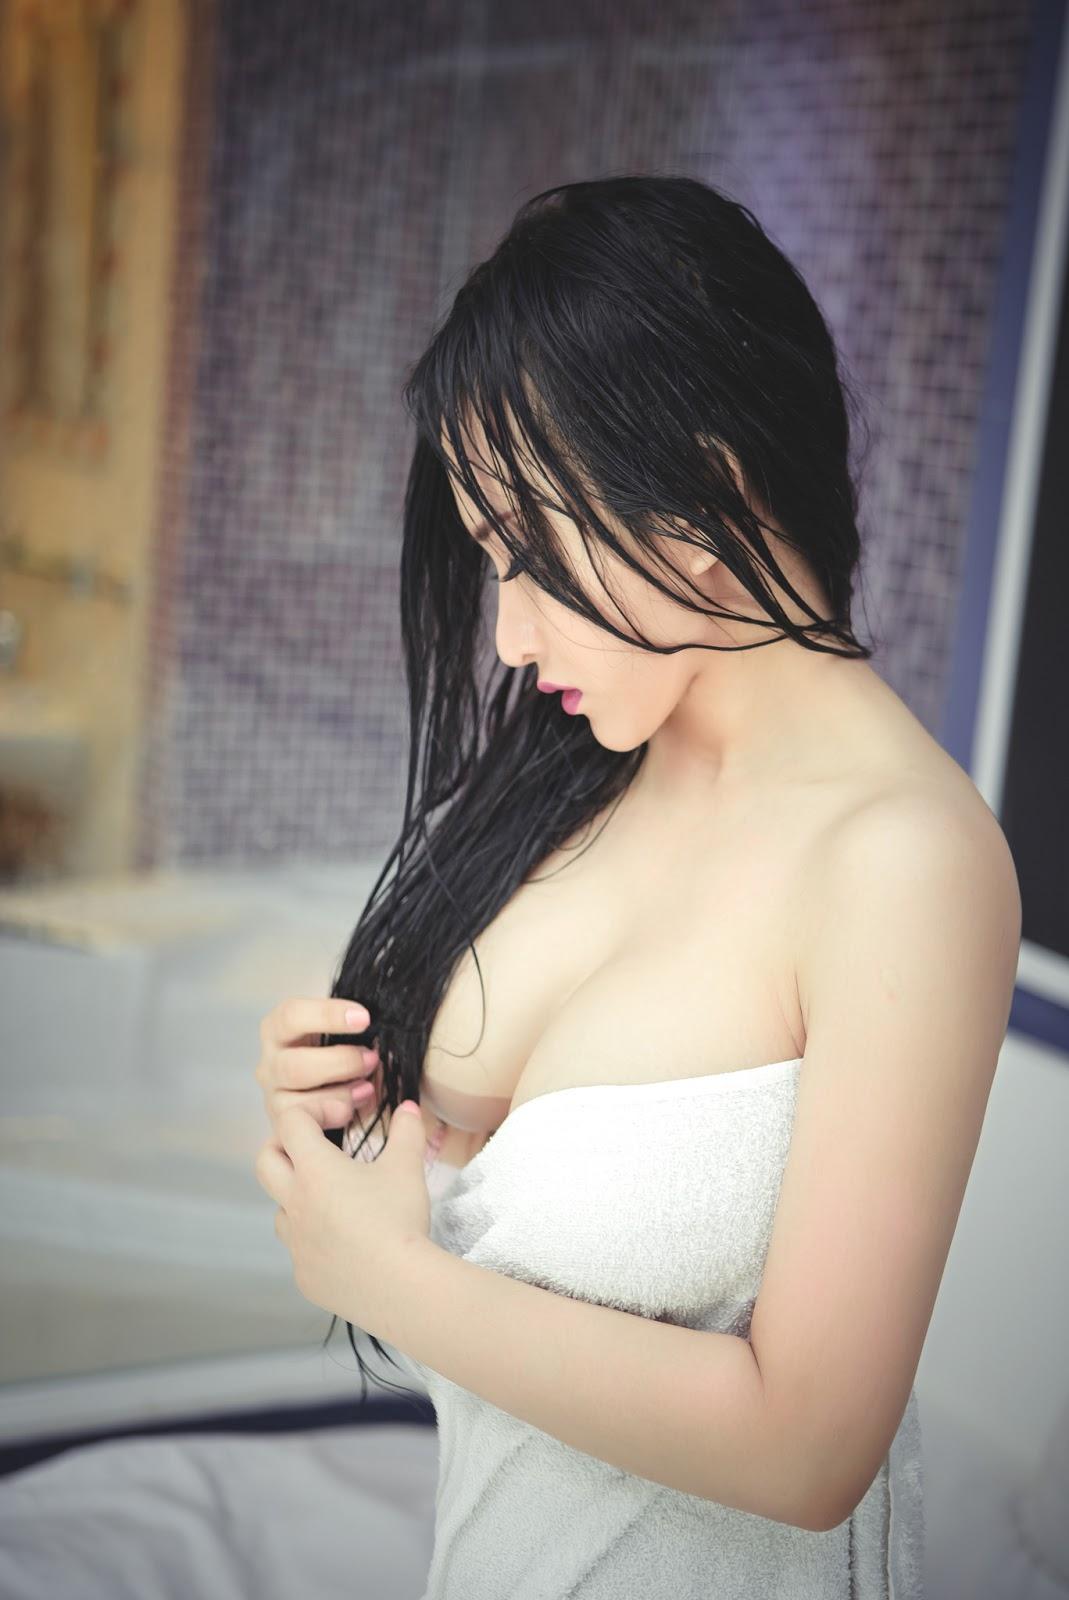 anh-nude-hot-girl-09.jpg